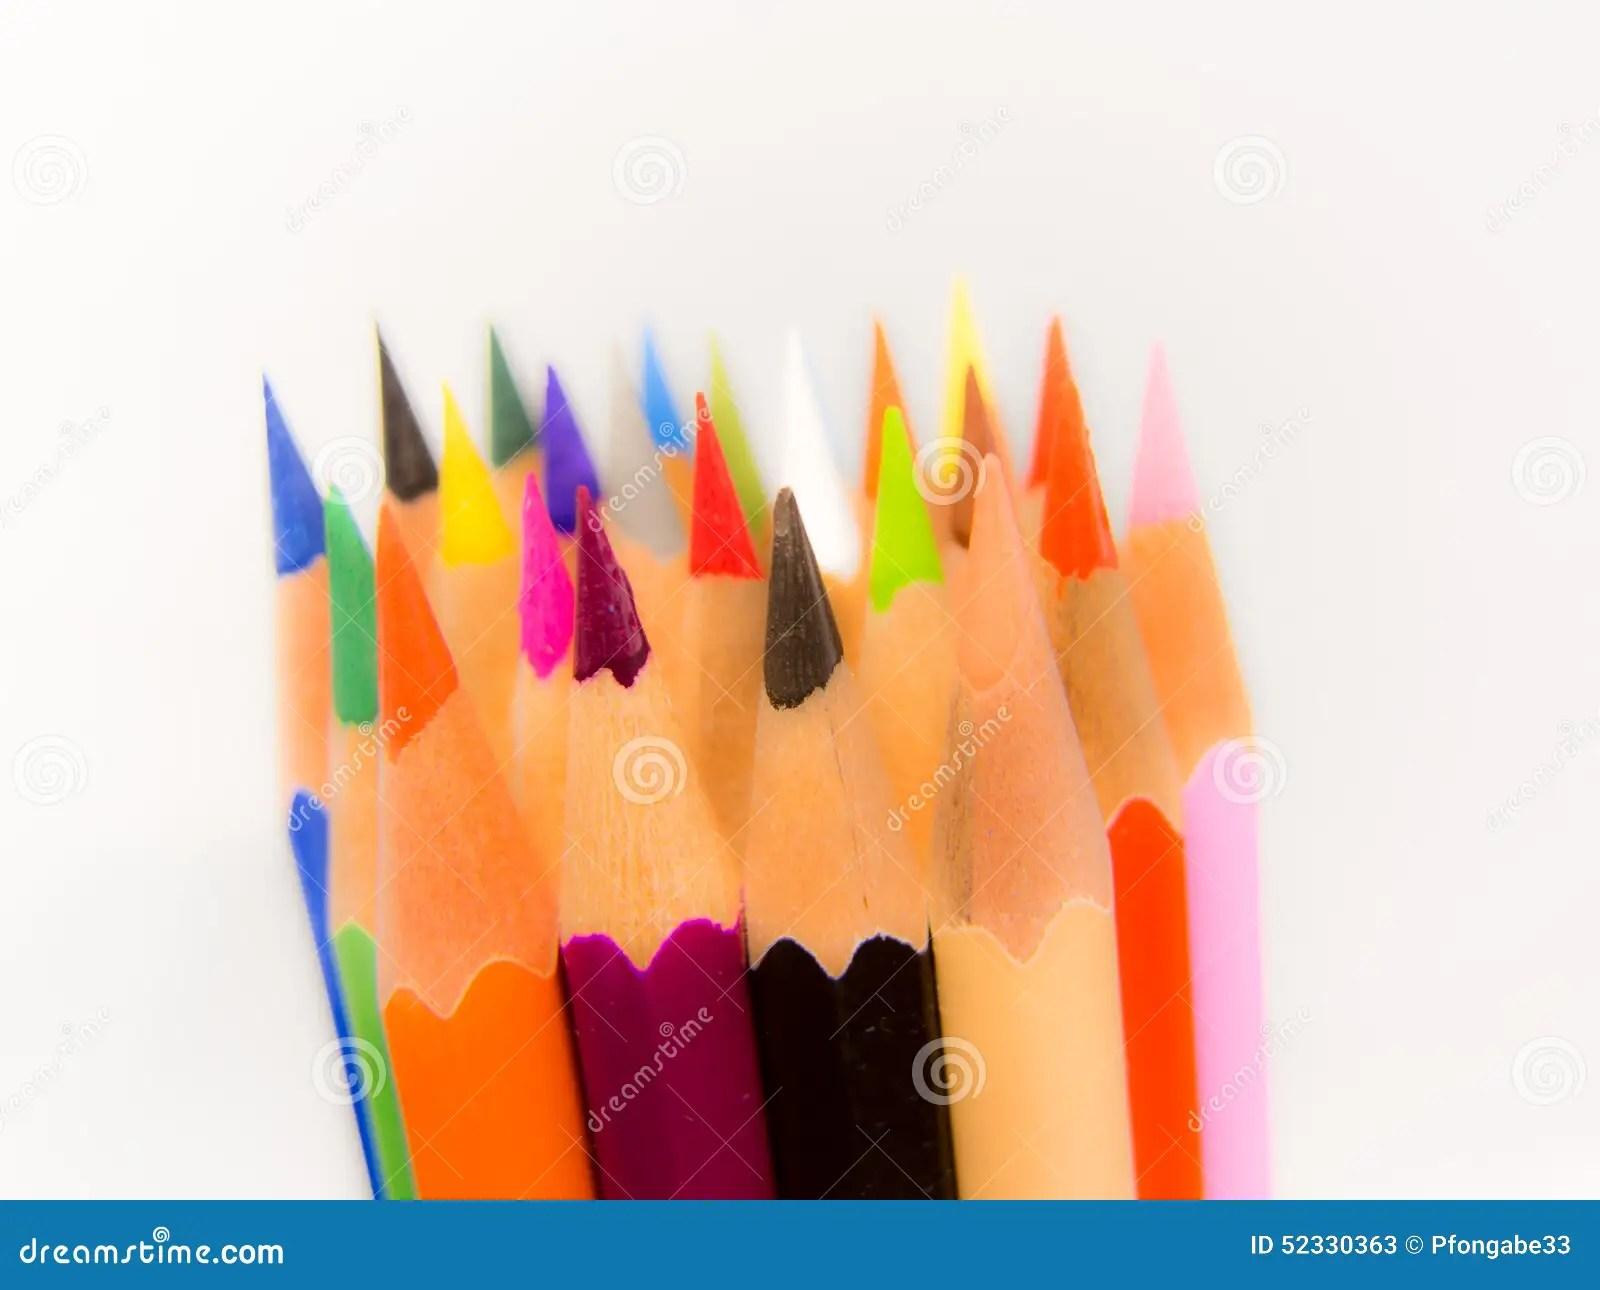 Crayon Tips Stock Photography